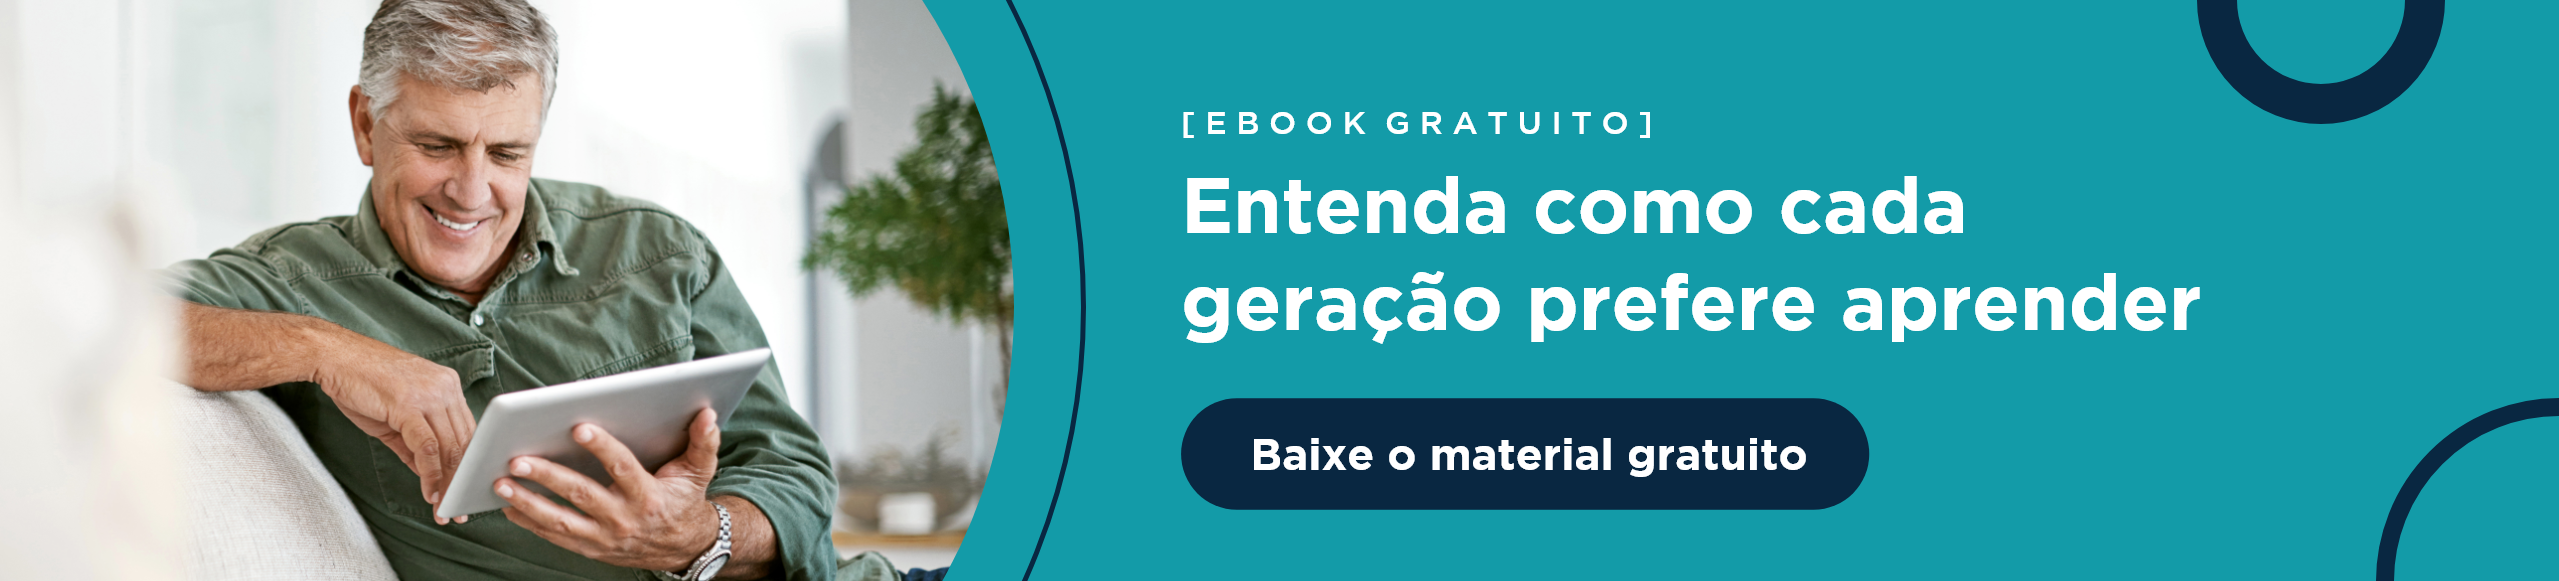 banner convite para baixar ebook